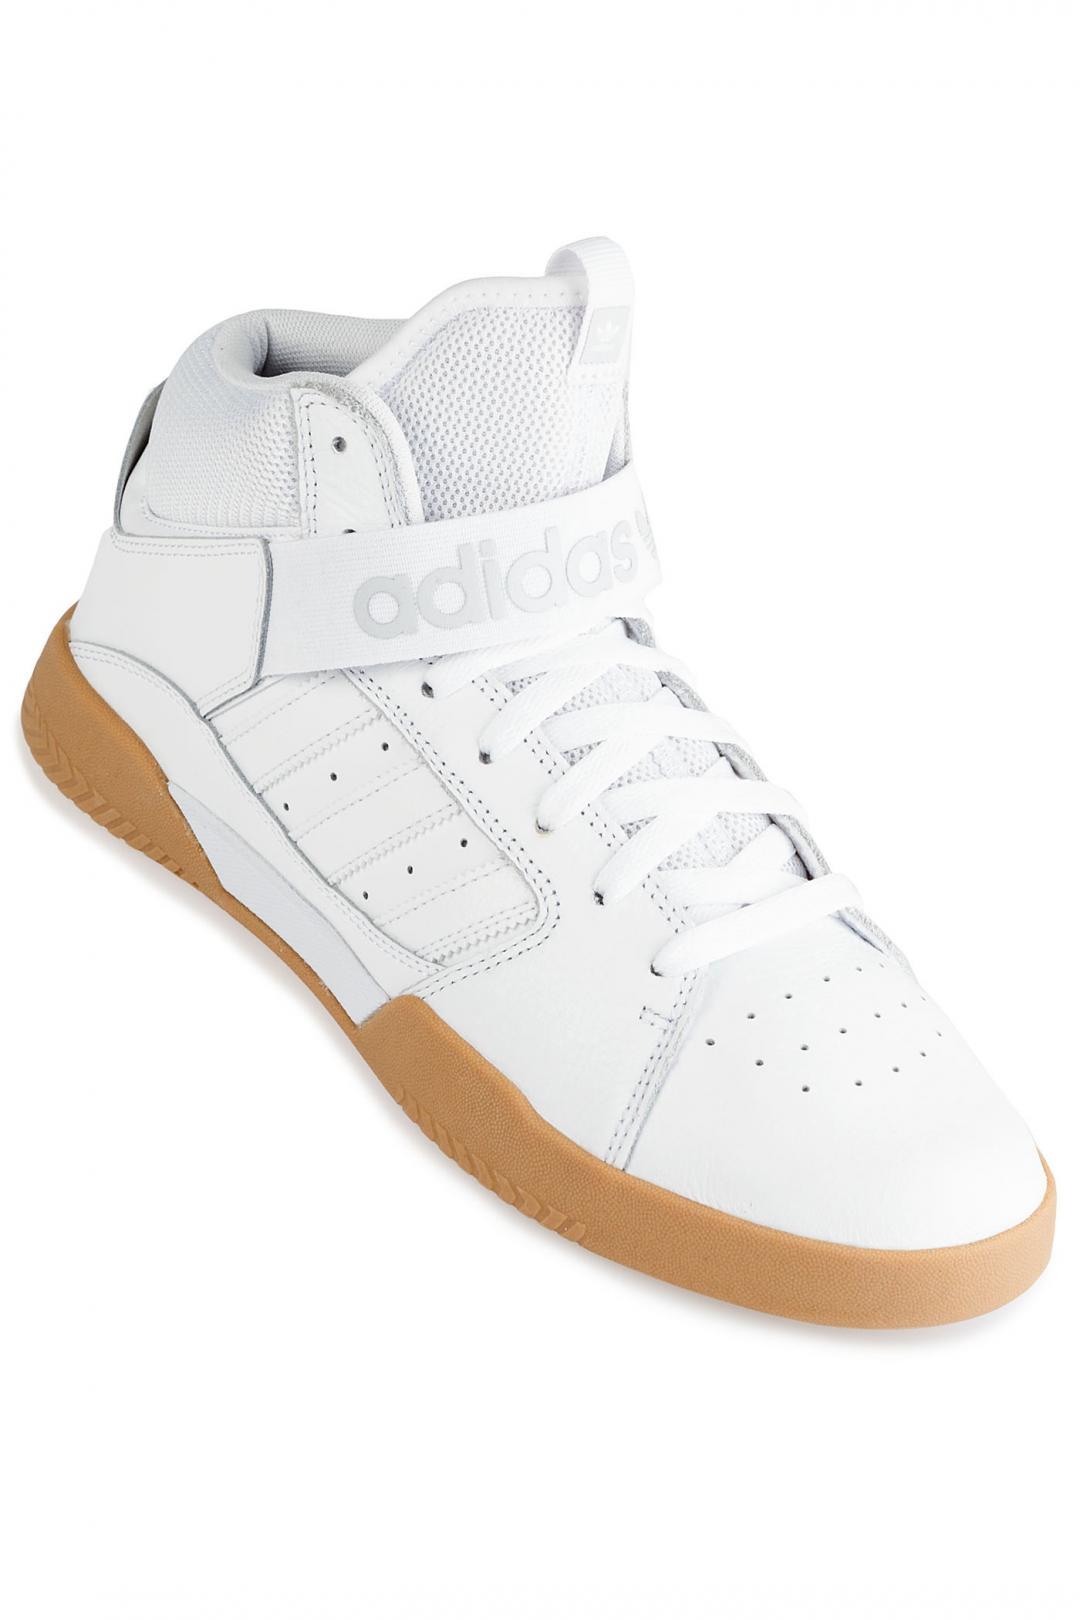 Uomo adidas Skateboarding VRX Mid white white gum | Sneaker